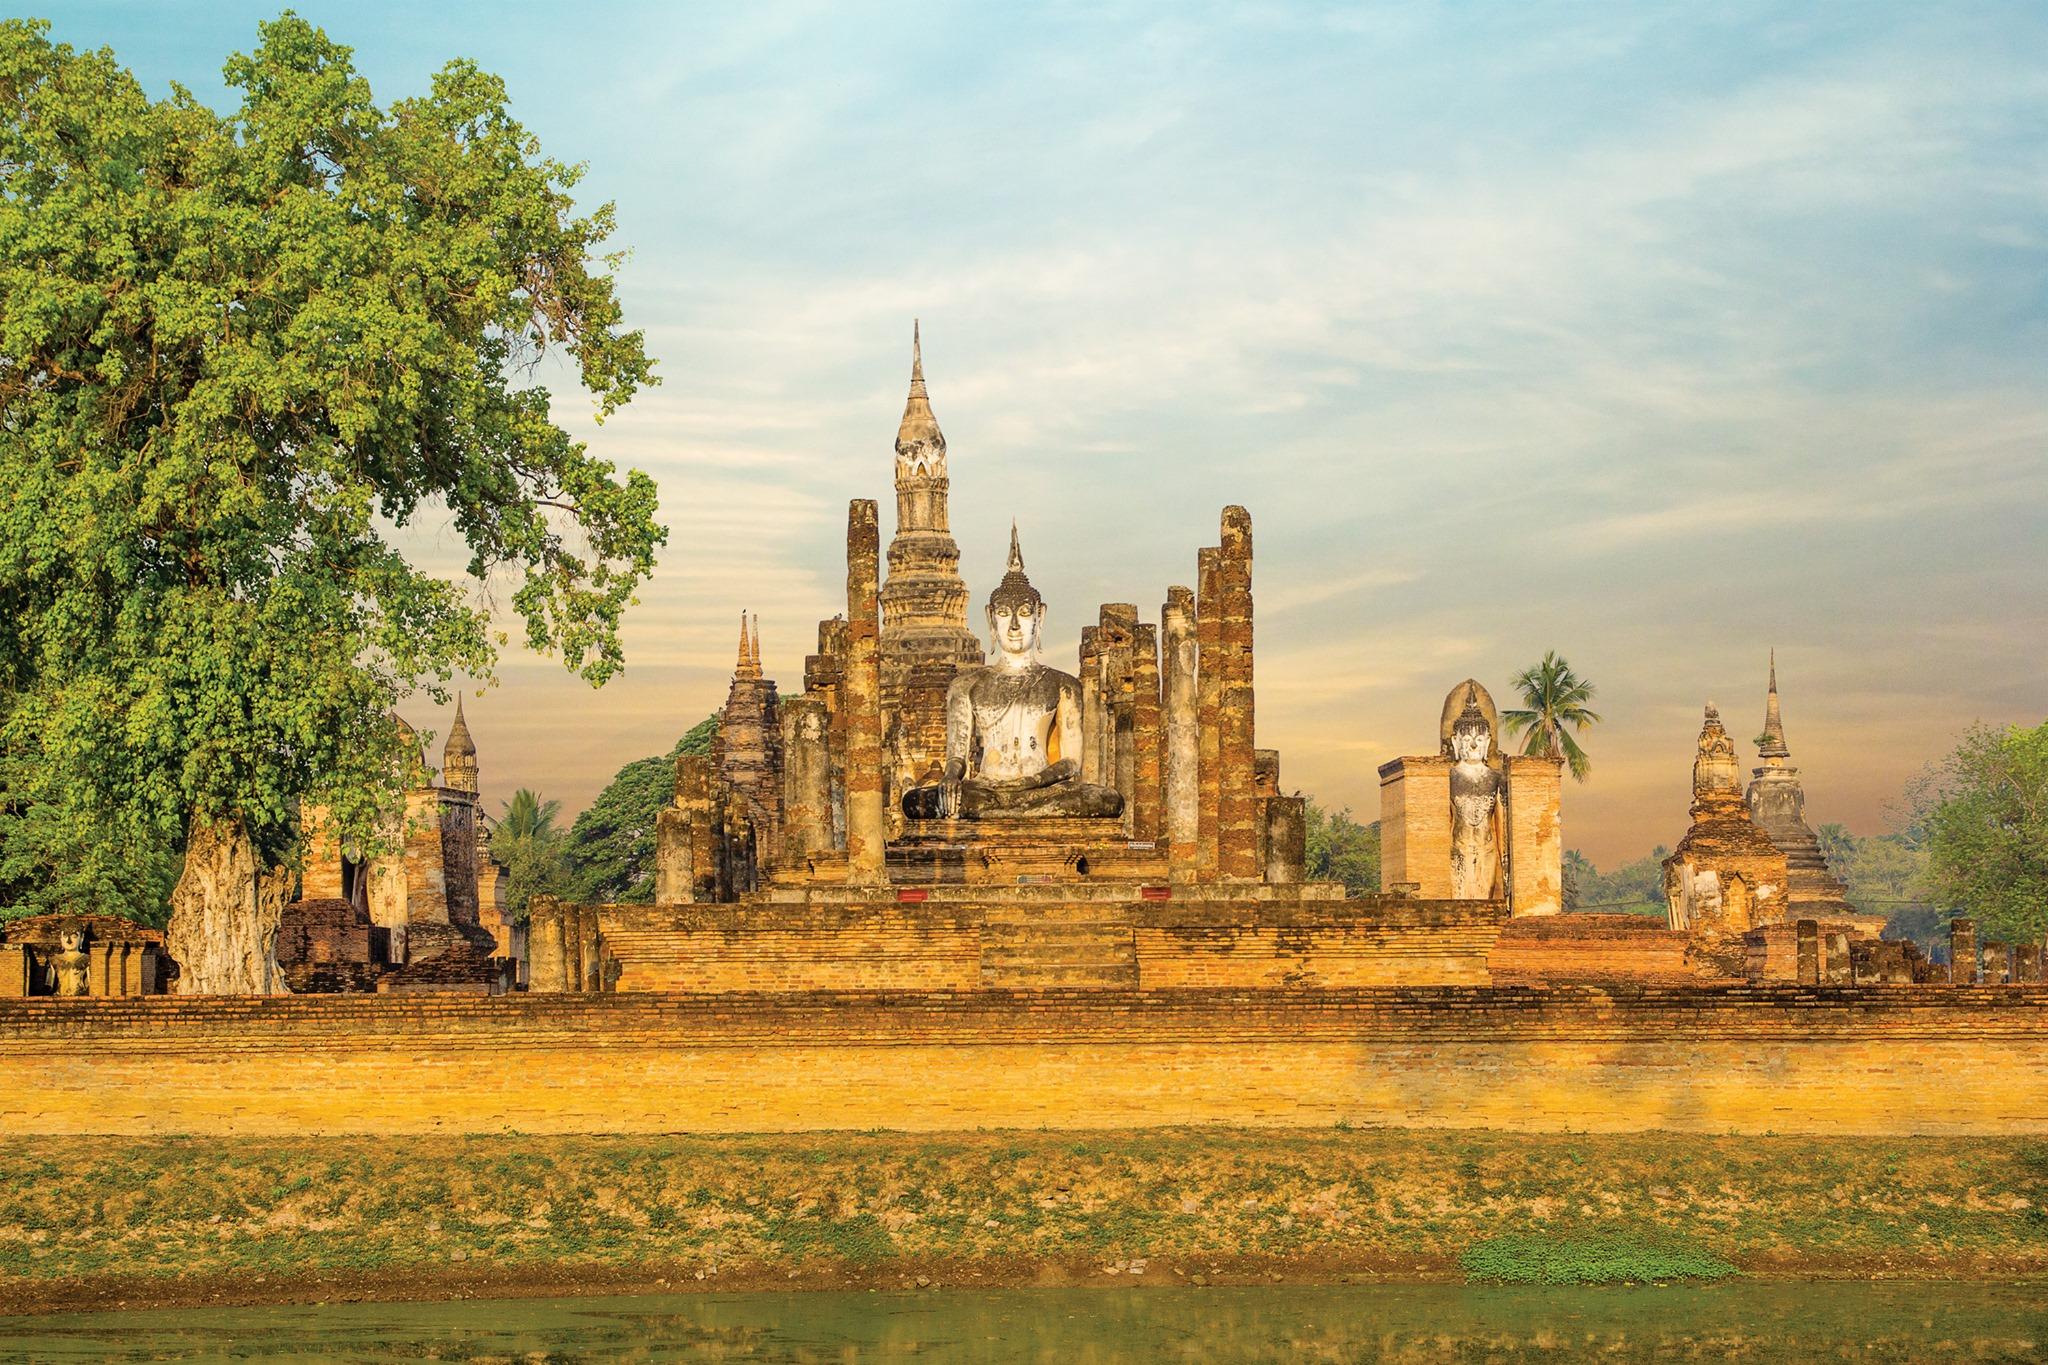 ONLINE: Historky z archivu: Thajsko očima skeptického dobrodruha